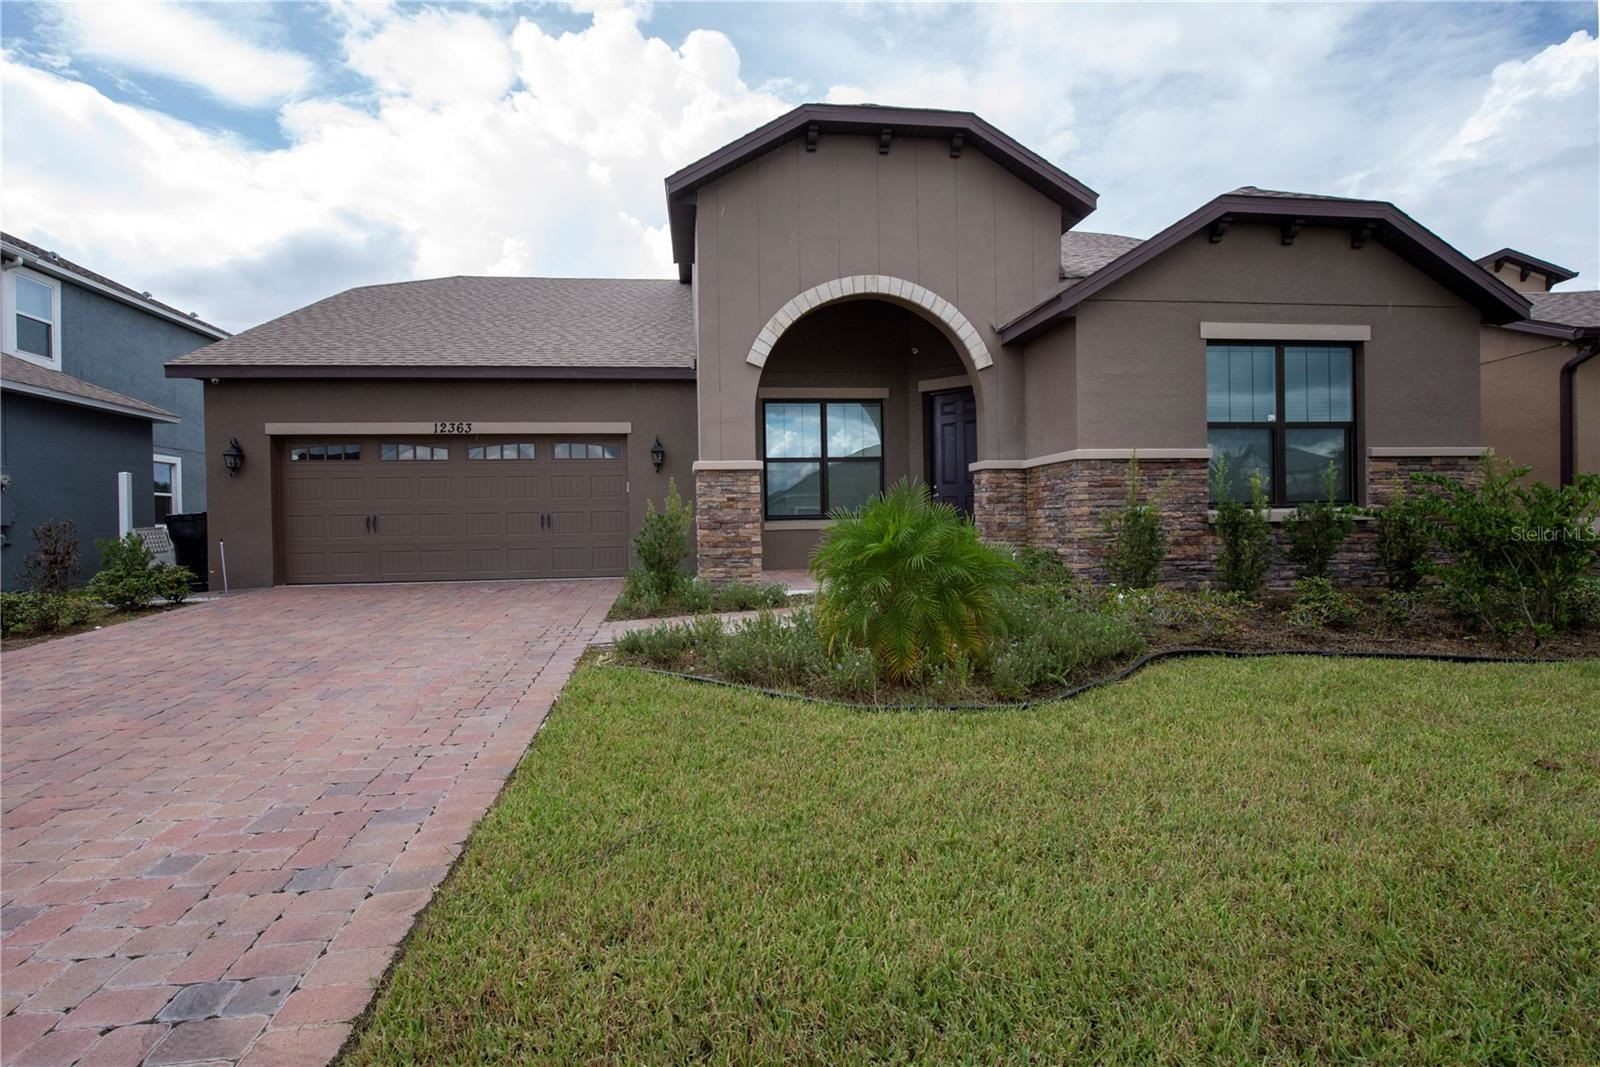 12363 NORTHOVER LOOP, Orlando, FL 32824 - #: S5056782